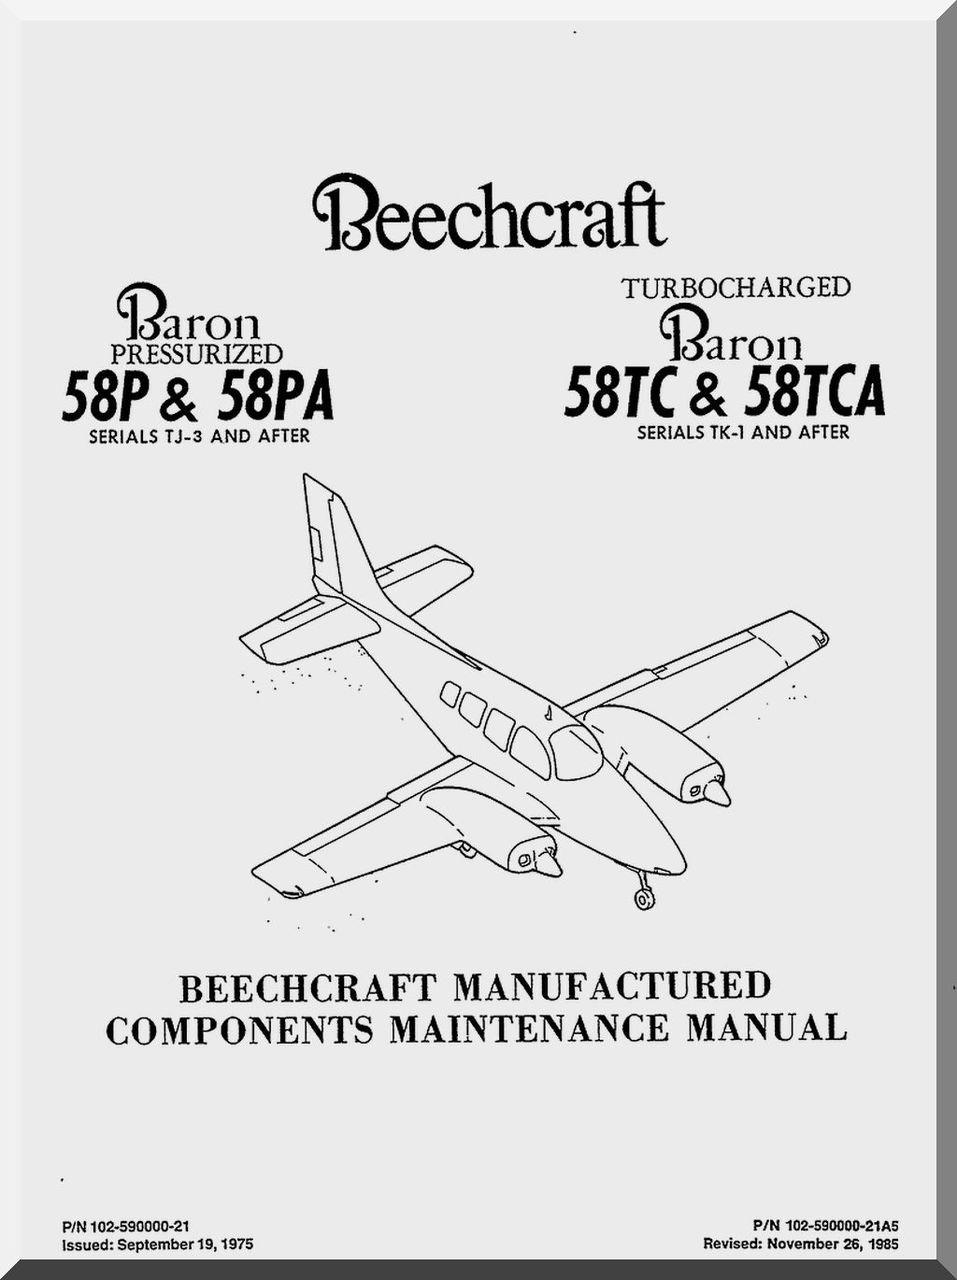 aircraft maintenance manuals